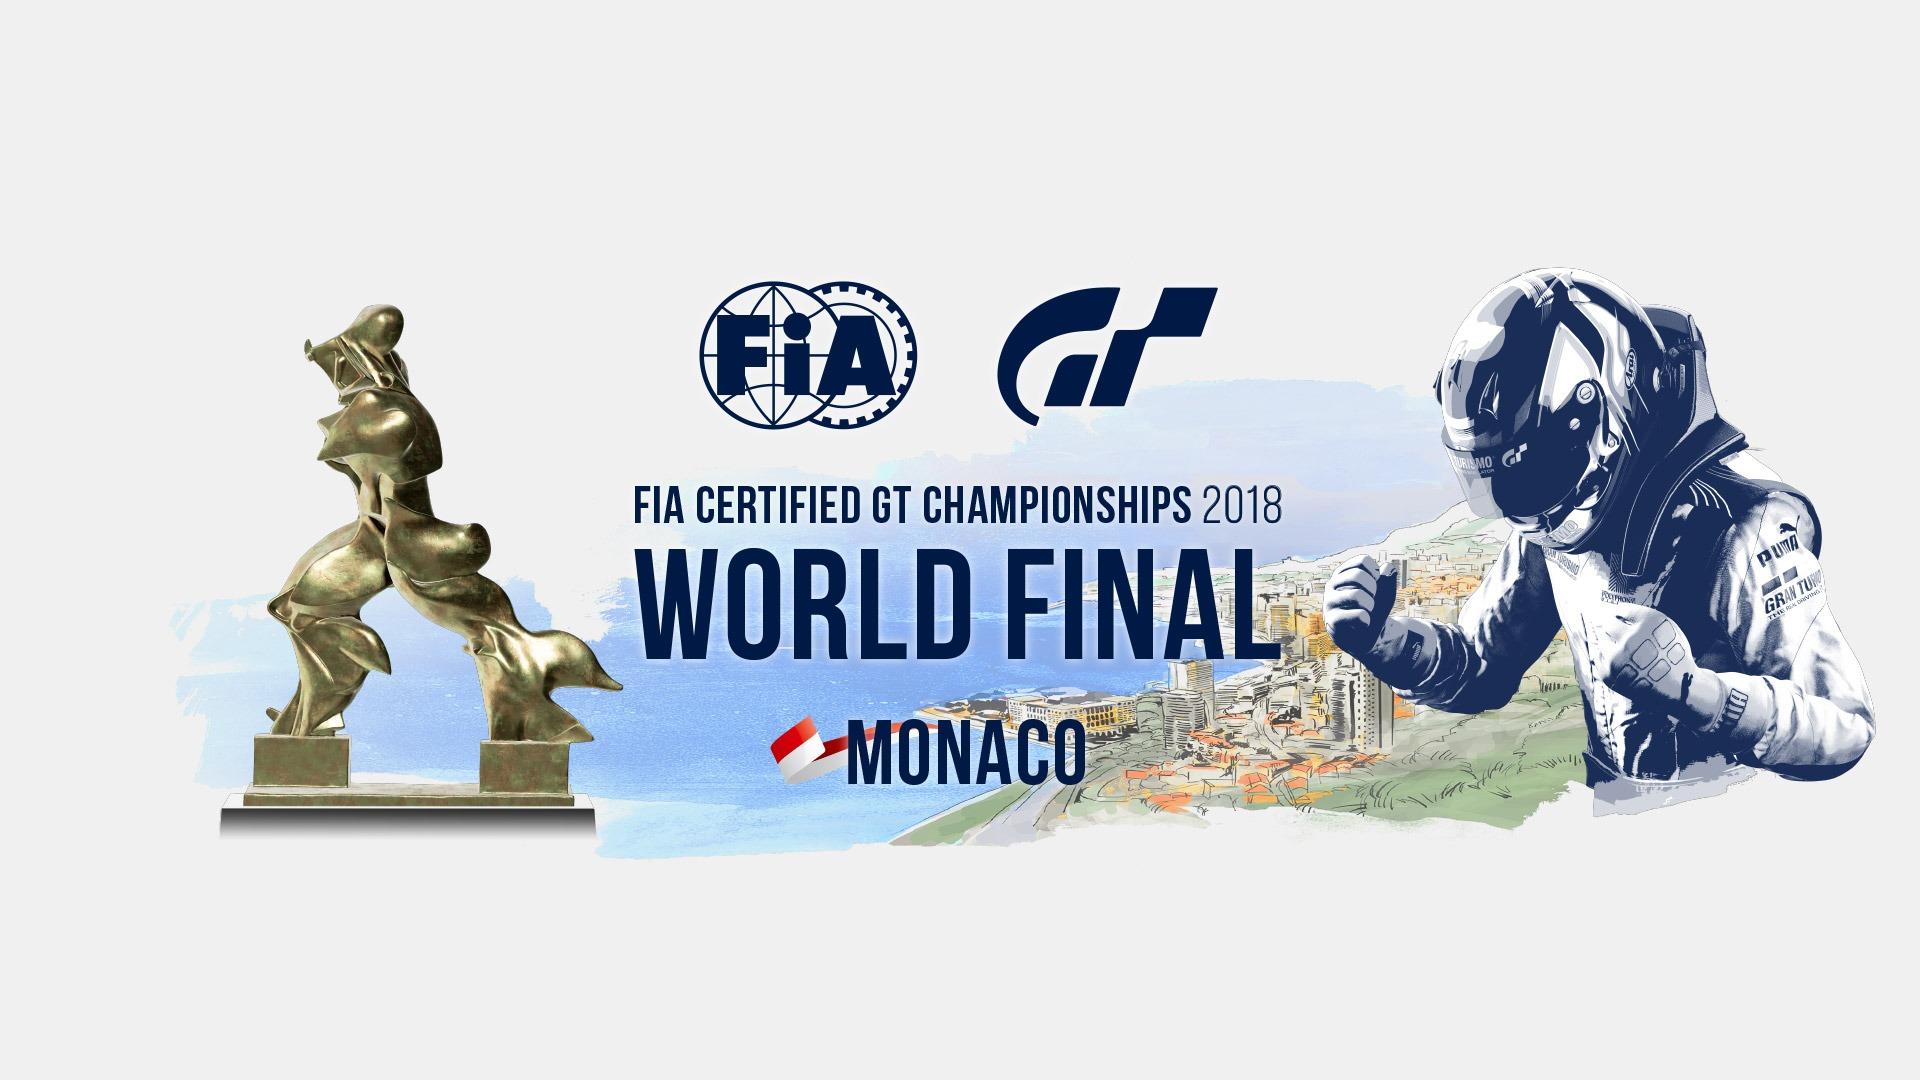 『FIA グランツーリスモ チャンピオンシップ 2018 ワールドファイナル』